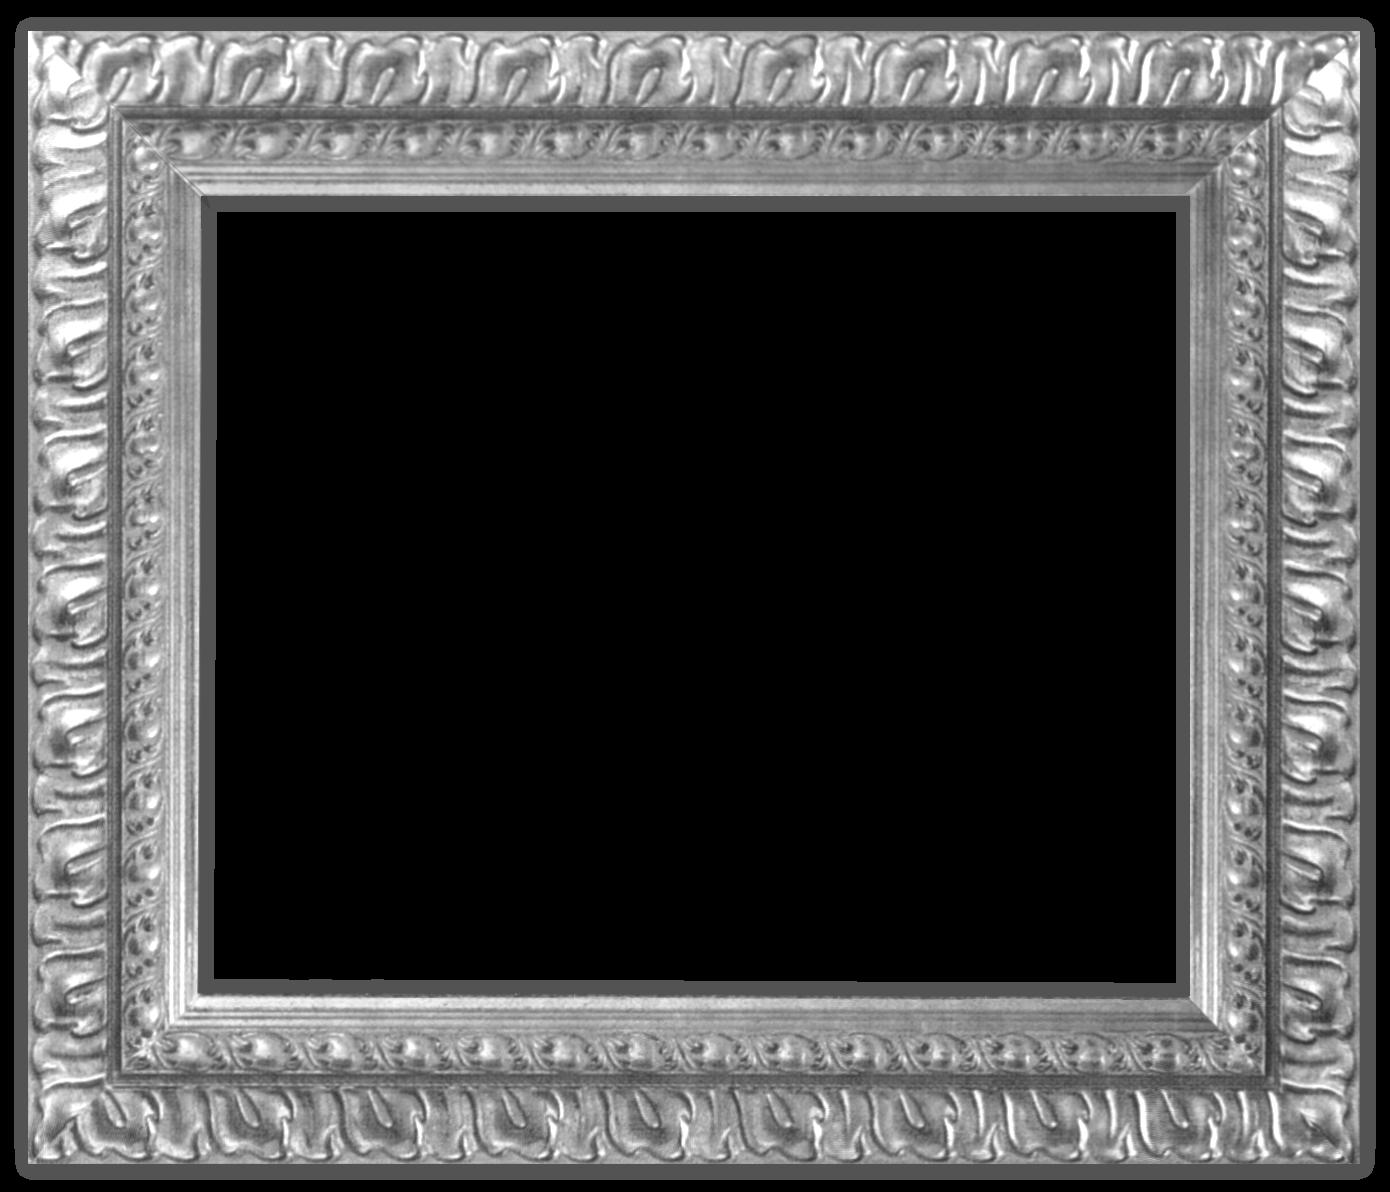 Silver Frames All Gold Frames All Silver Frames Stone Wooden Frames Frame Digital Scrapbooking Silver Picture Frames